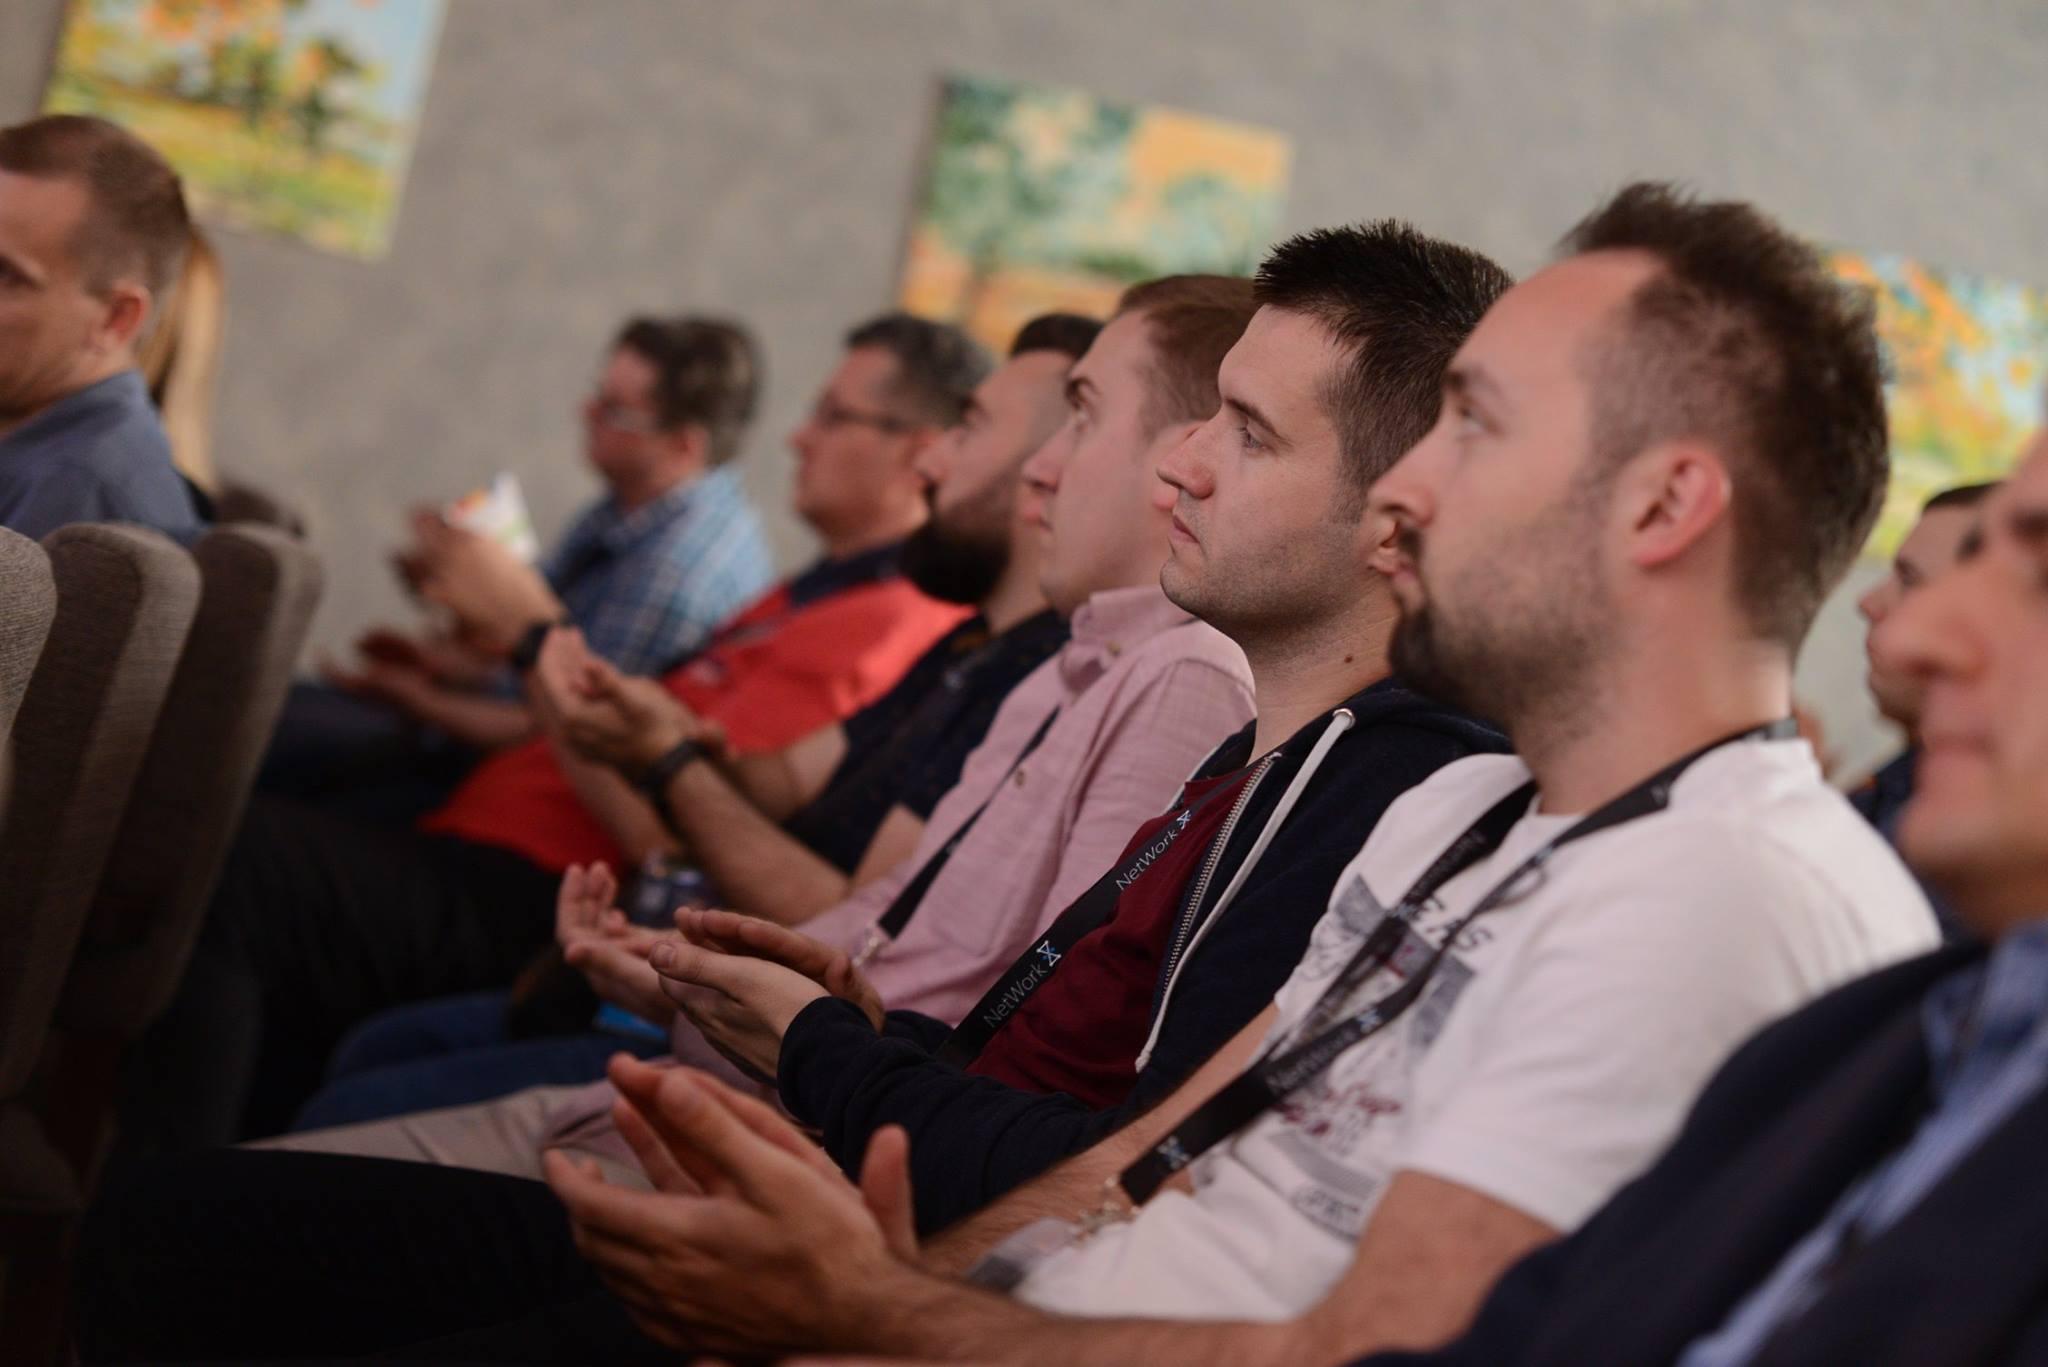 Prvi dan MSNetWork 8konferencije: Business Day predavanja i radionice